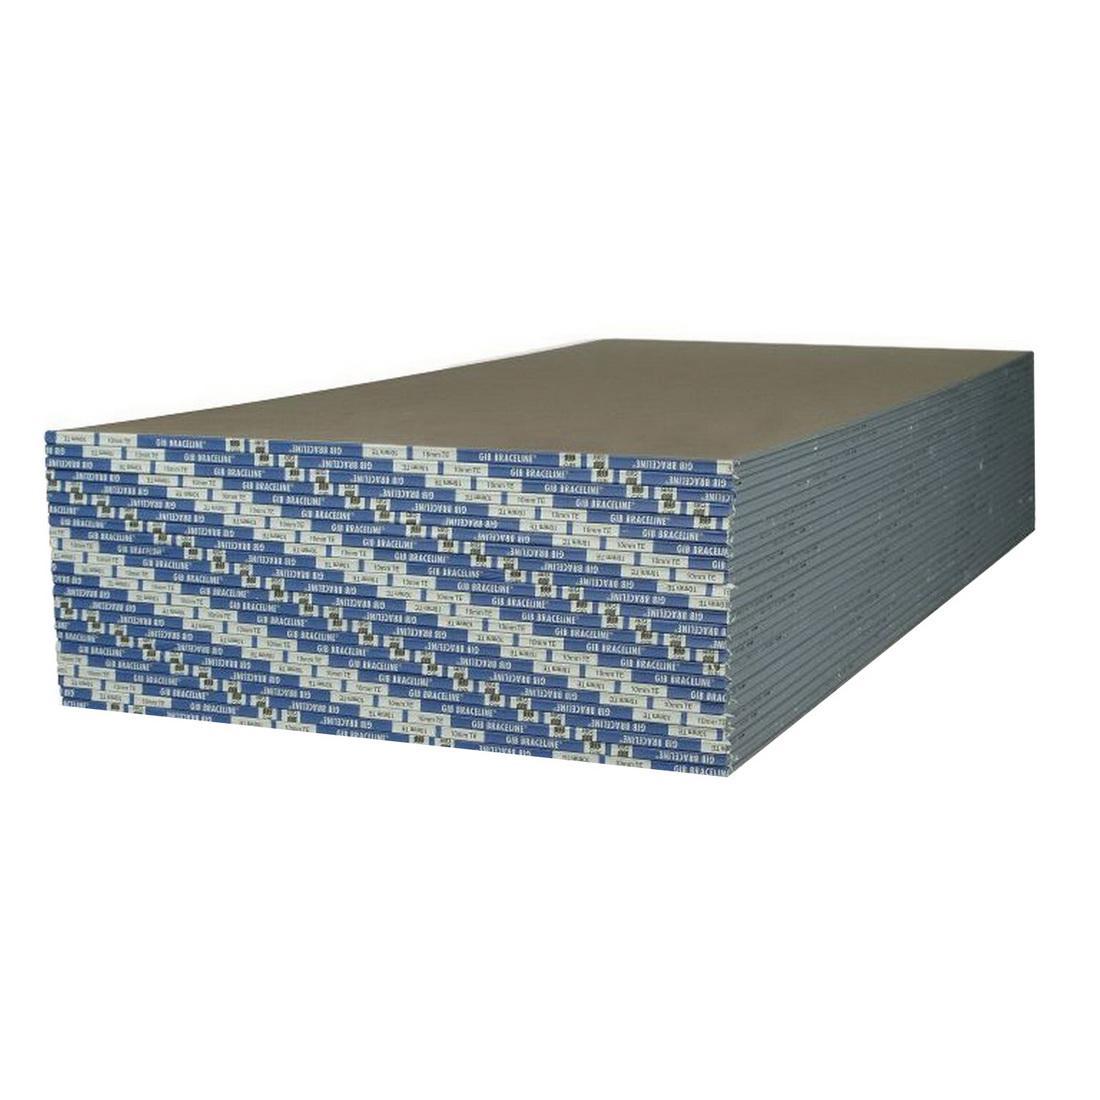 Braceline Noiseline Taper/Square Edge Plasterboard 4800 x 1350 x 13mm 15097